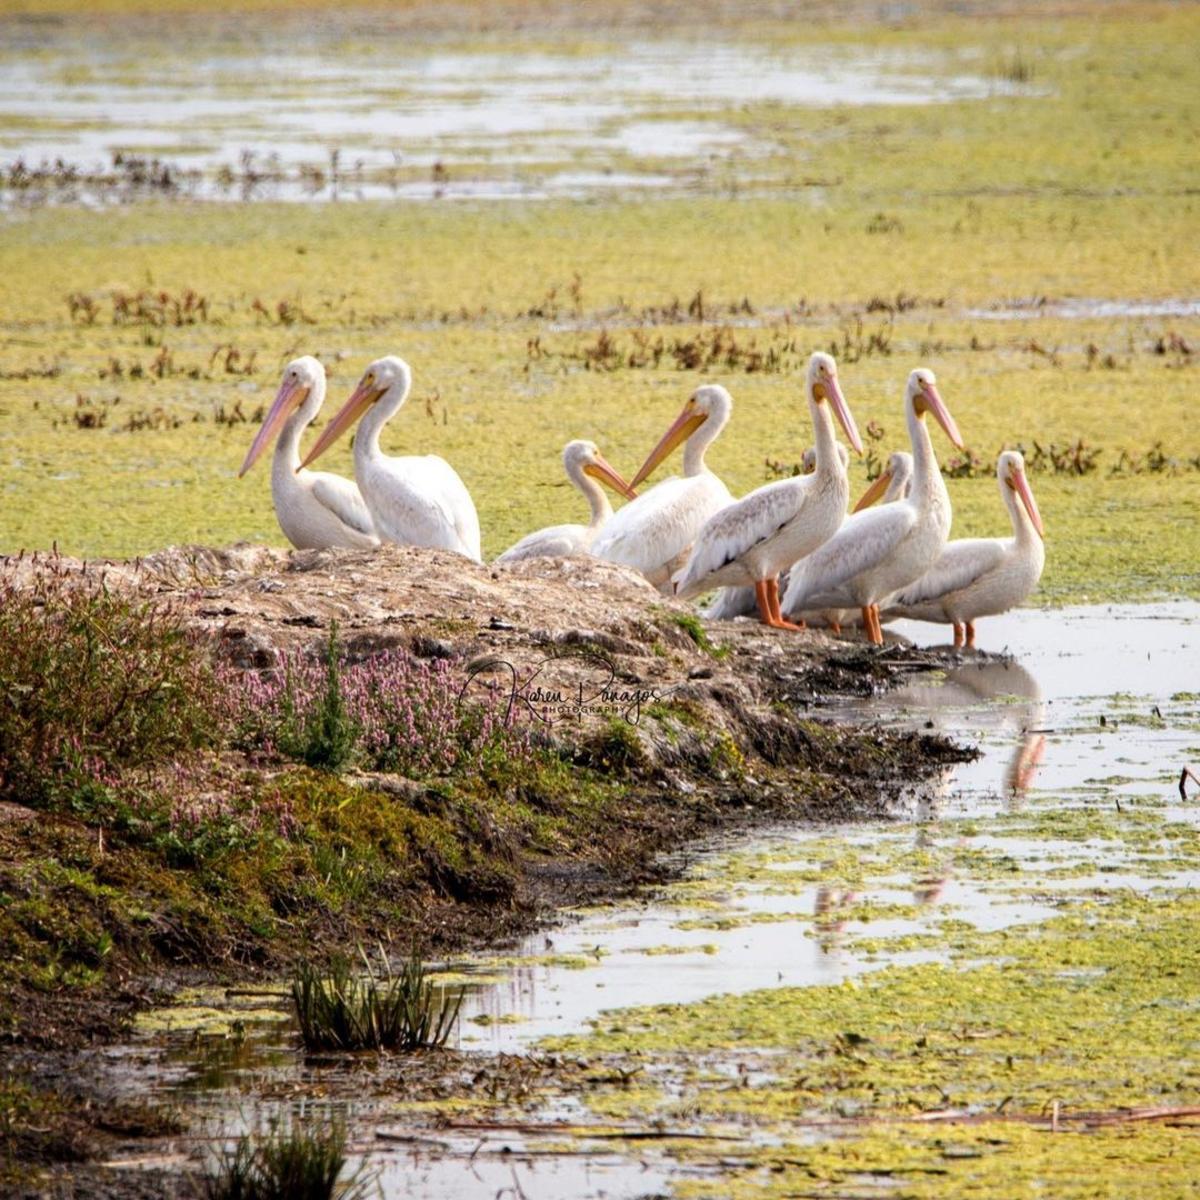 Pelicans gathered at Shiawassee National Wildlife Refuge in Saginaw